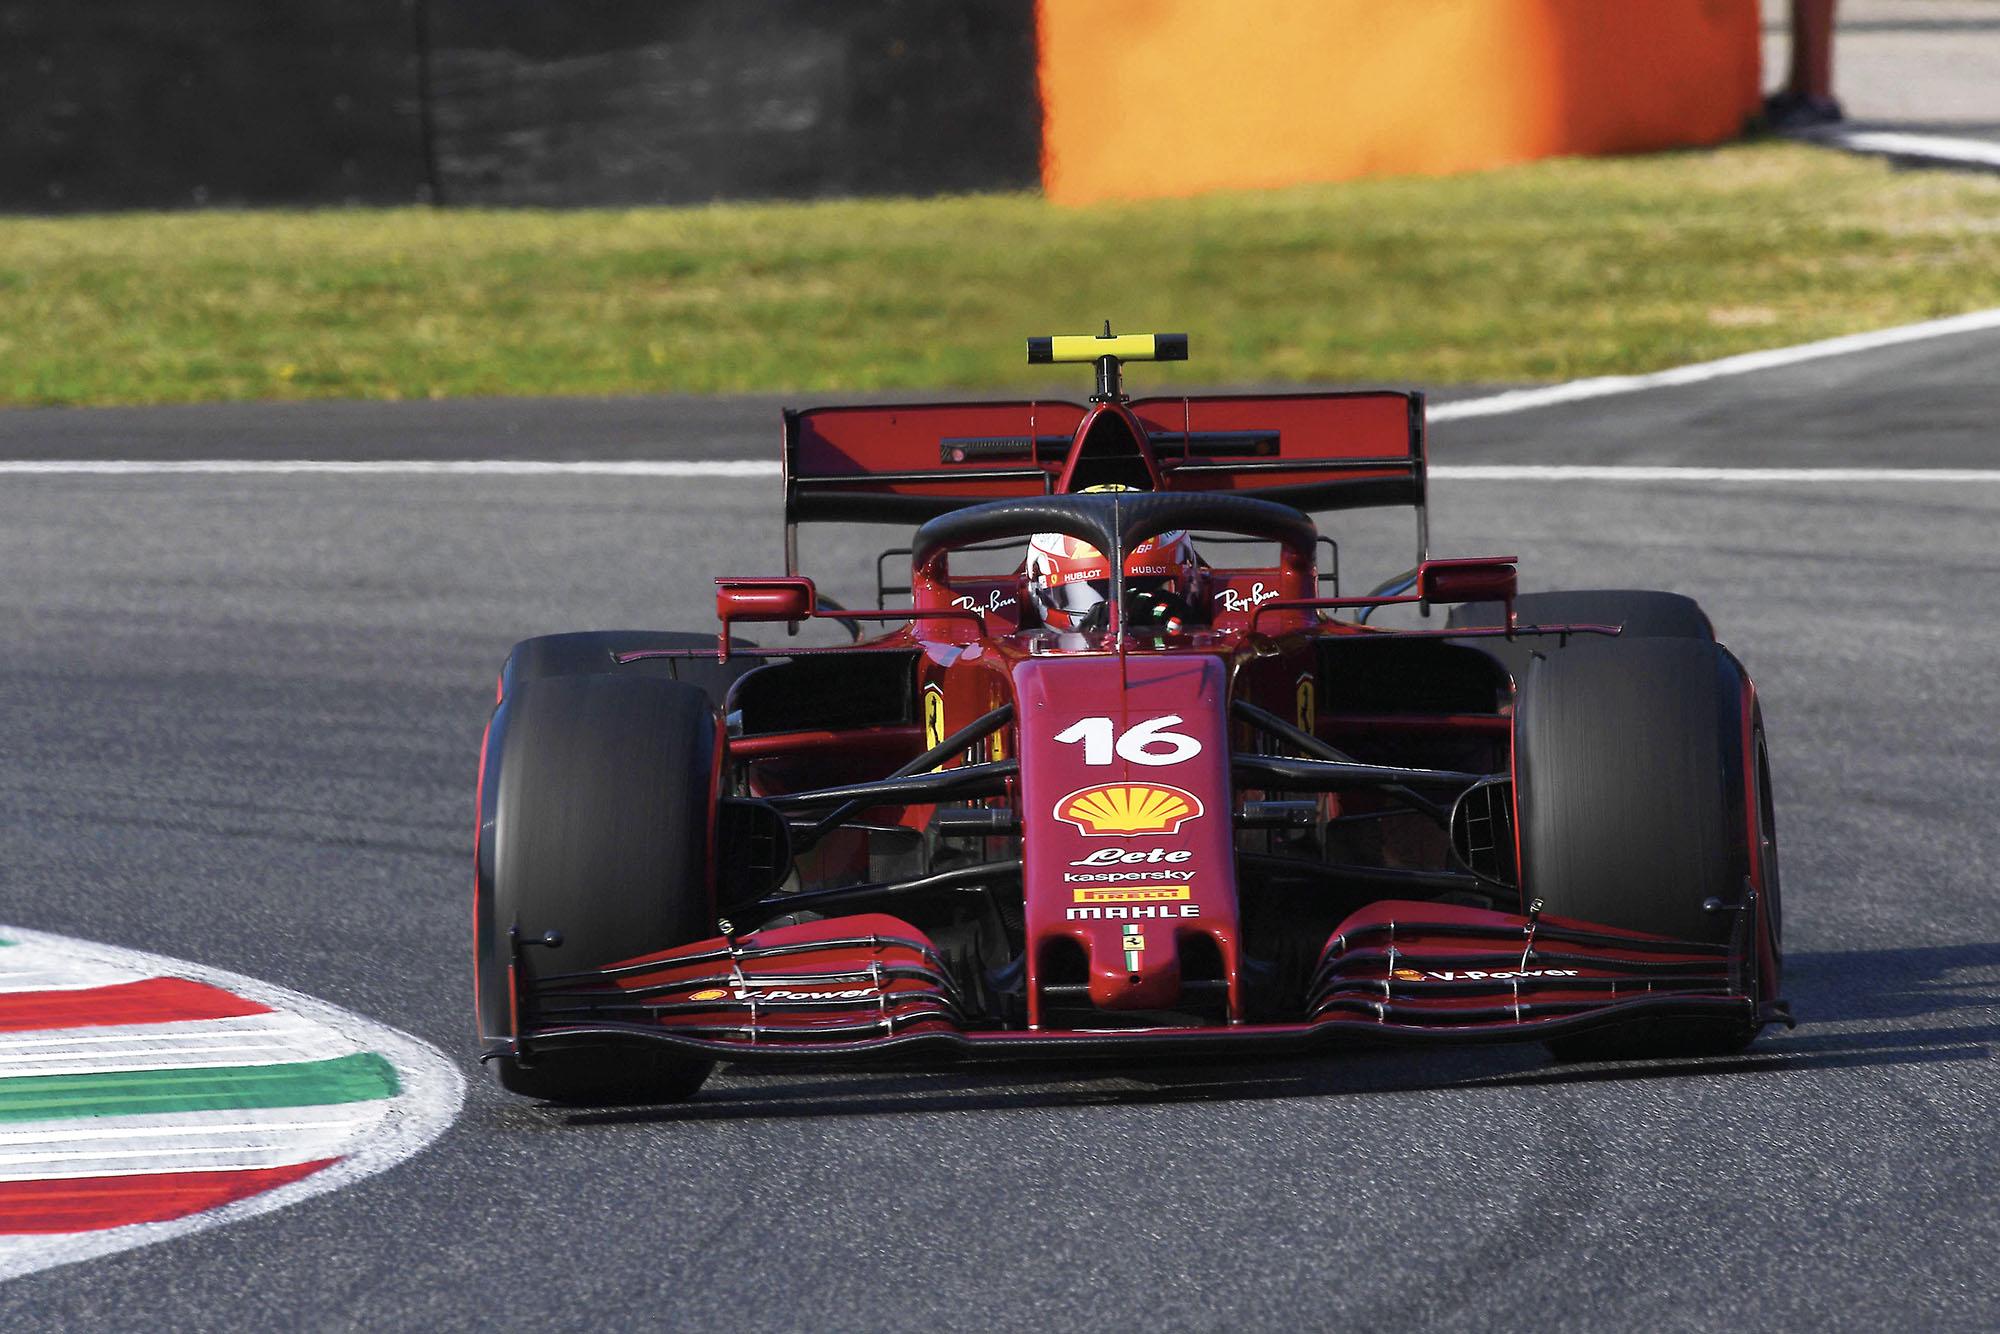 Ferrari Tuscan GP